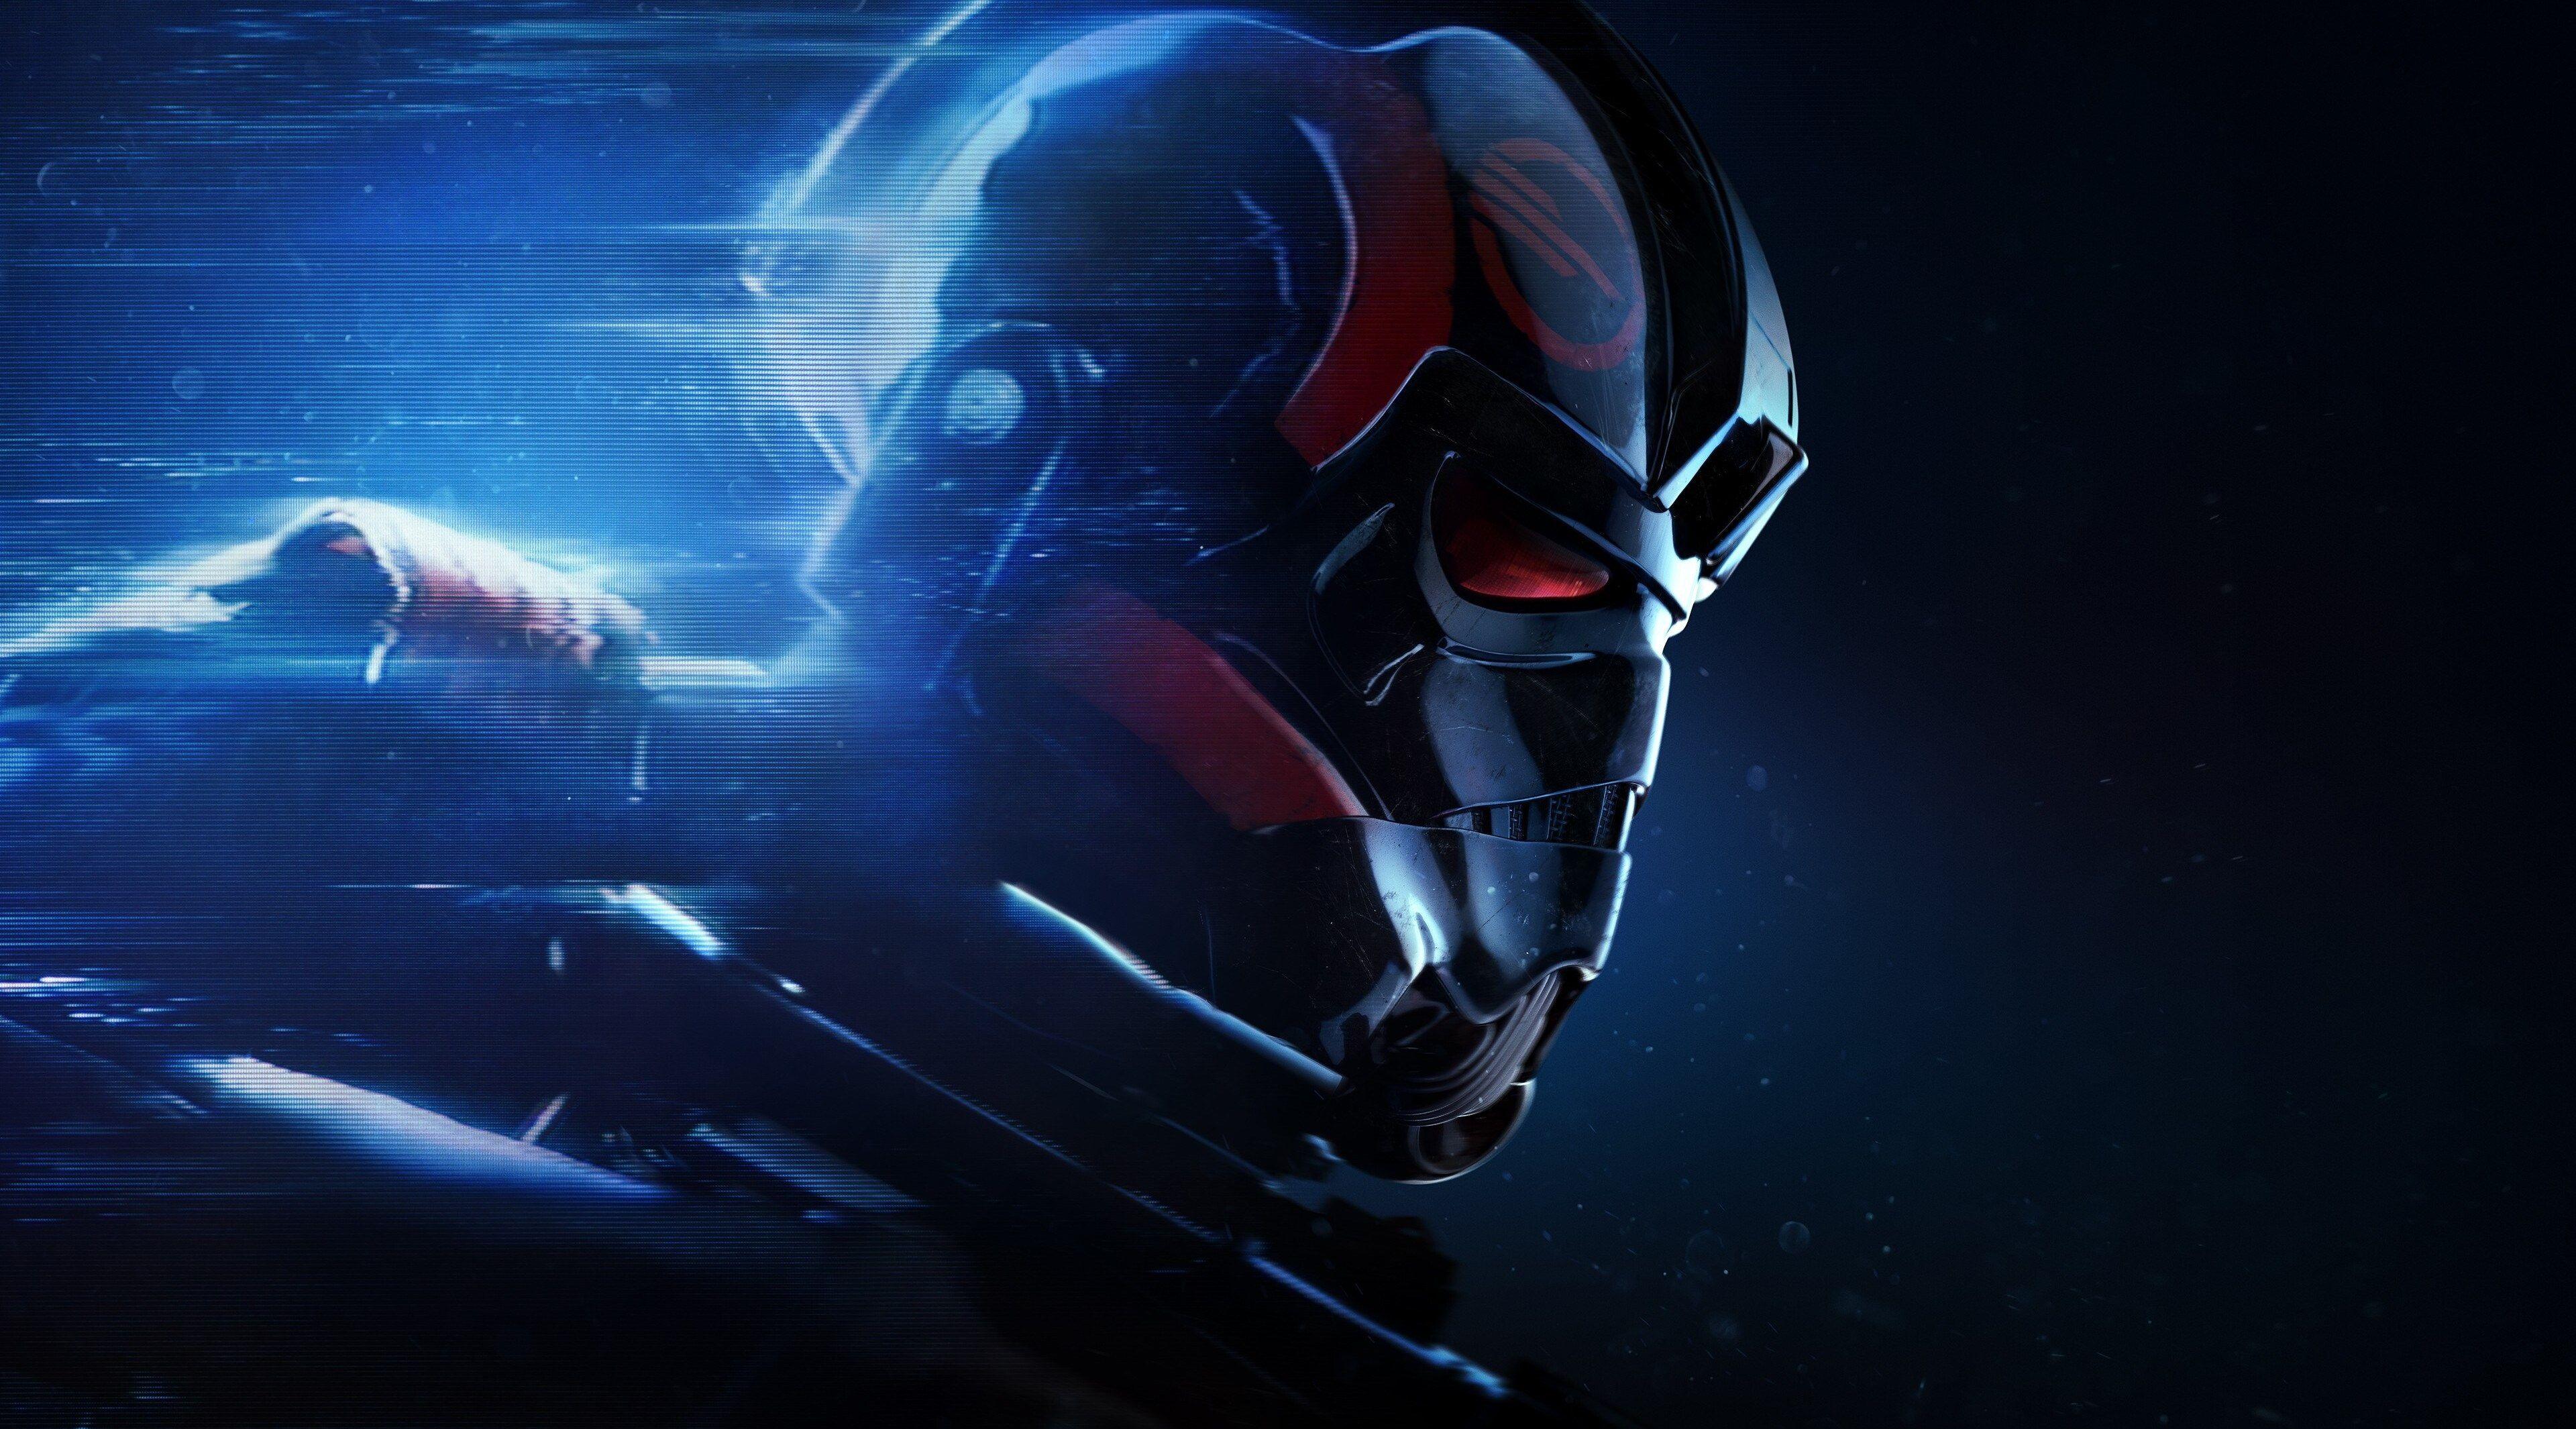 3840x2130 Star Wars Battlefront Ii 4k Desktop High Resolution Wallpapers Seoul Atlanta Victoria